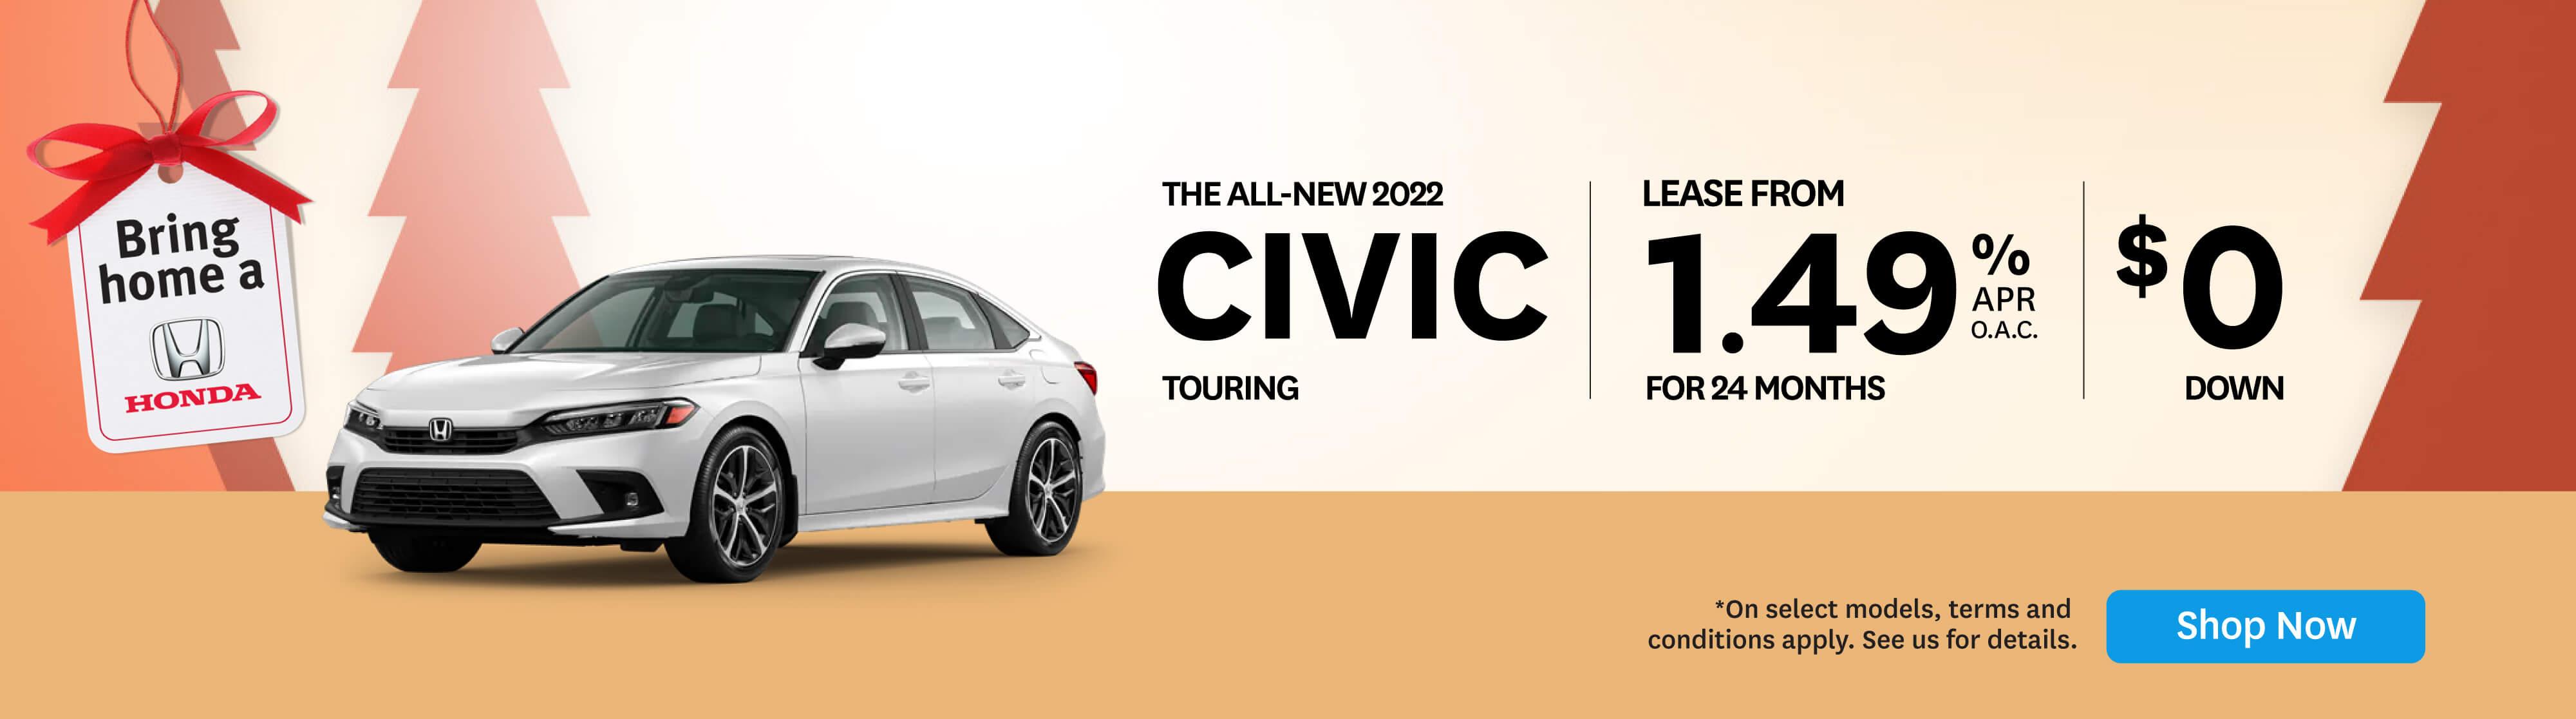 The 2022 All-New Honda Civic